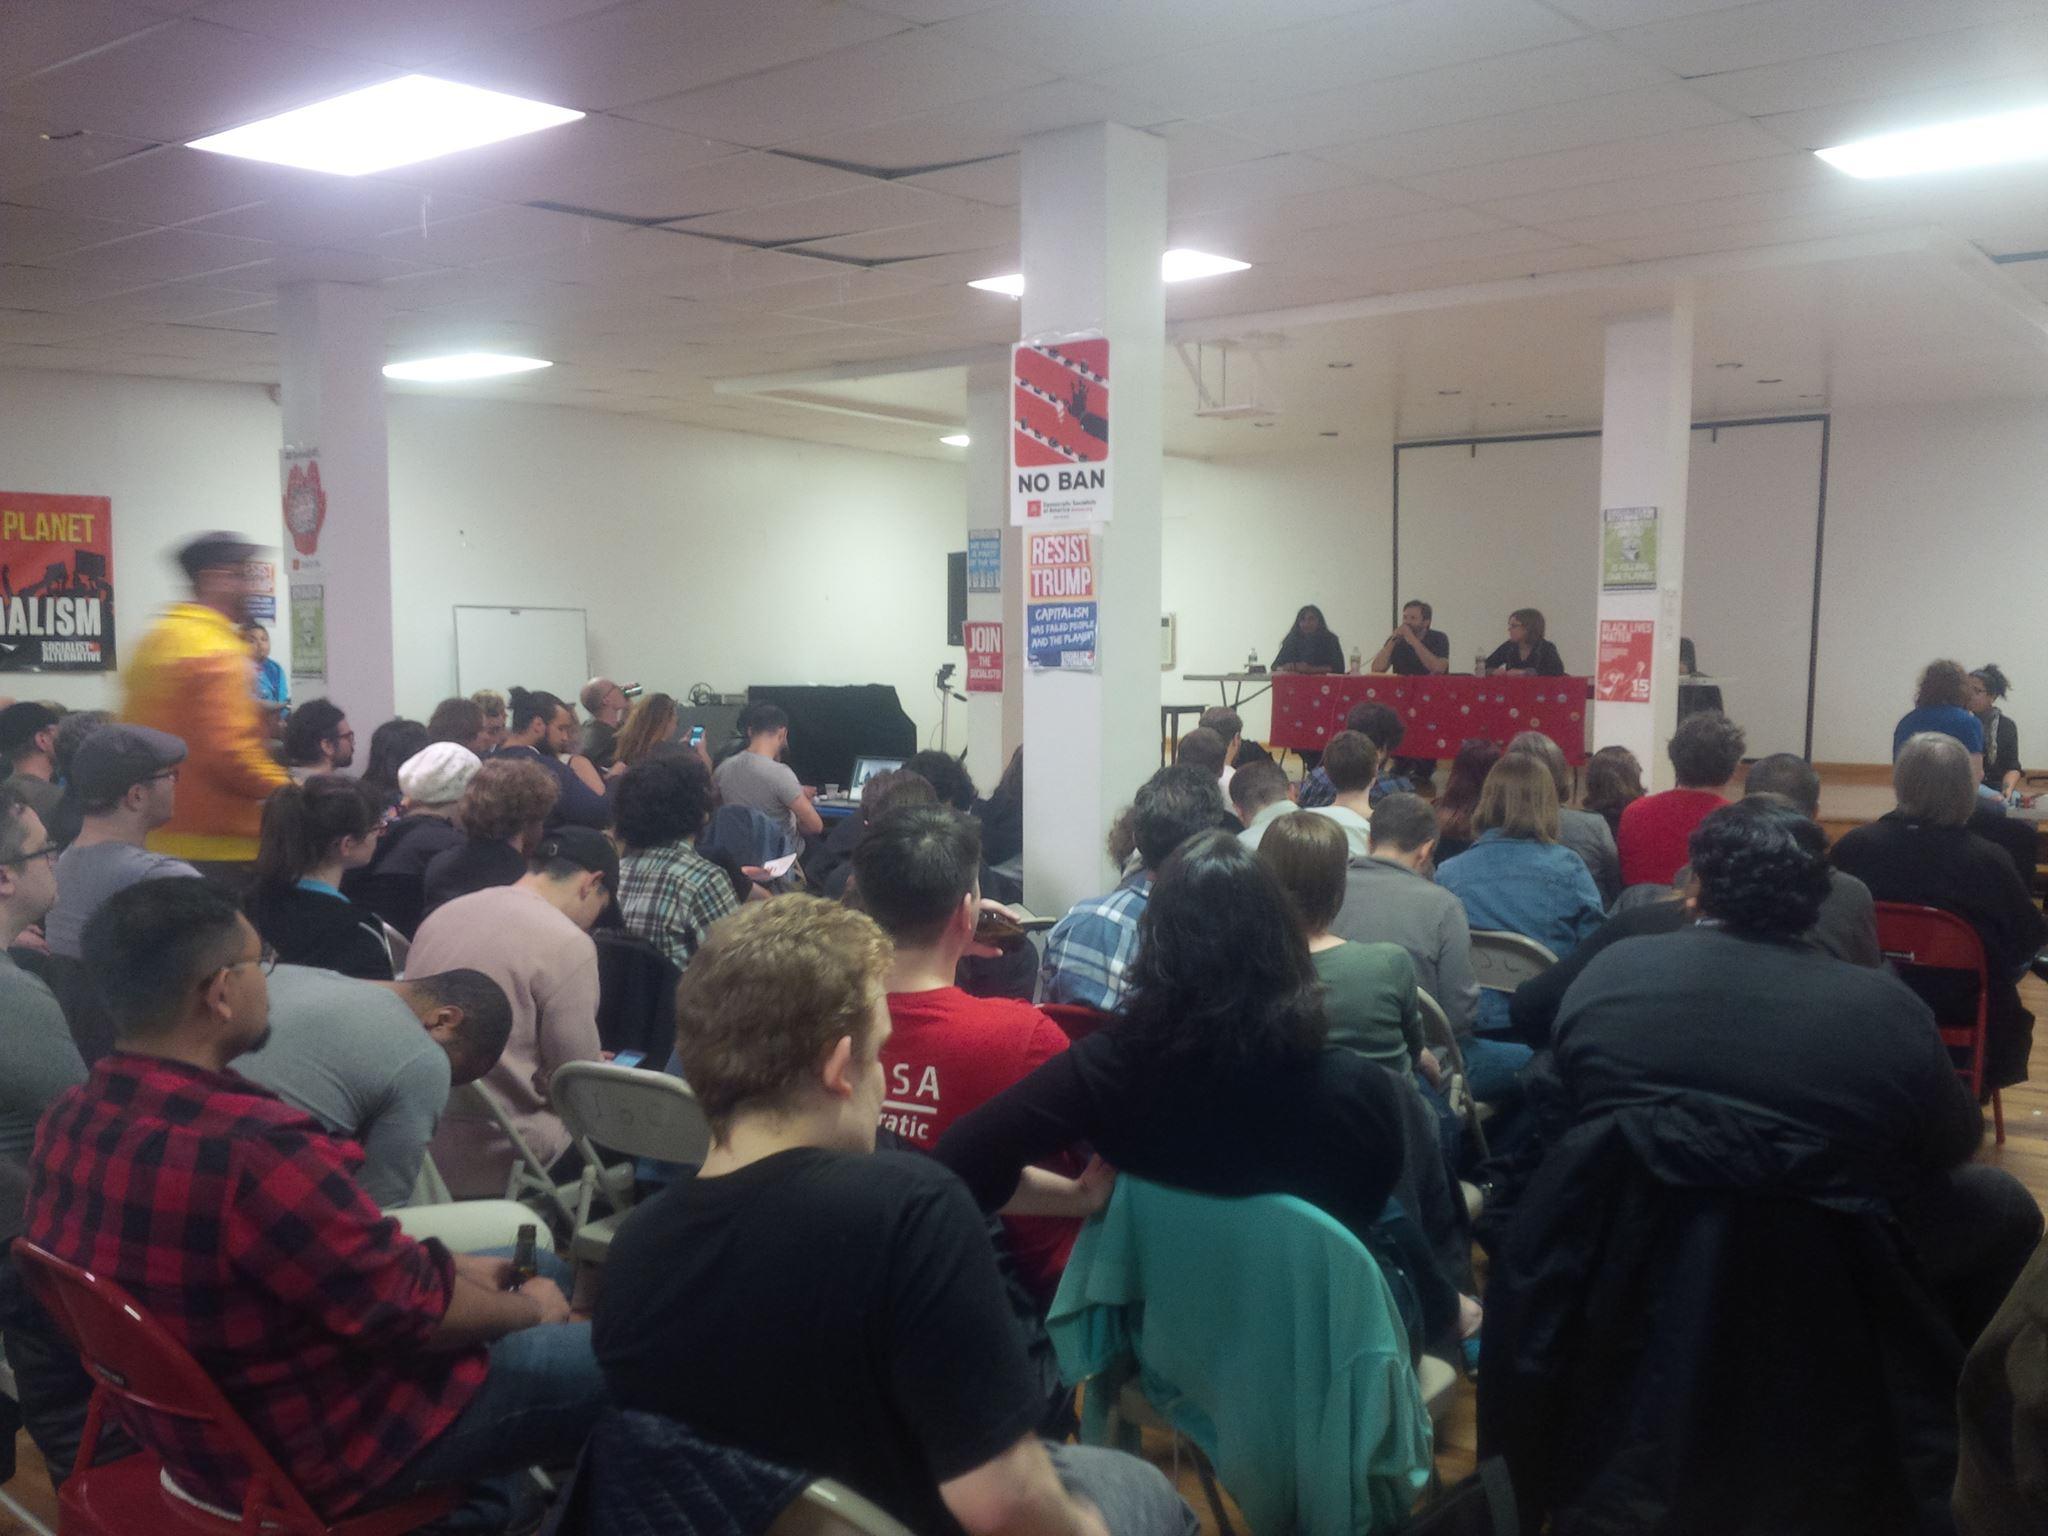 Debat tussen Kshama Sawant (Socialist Alternative) en Bhaskar Sunkara (Democratic Socialists of America)